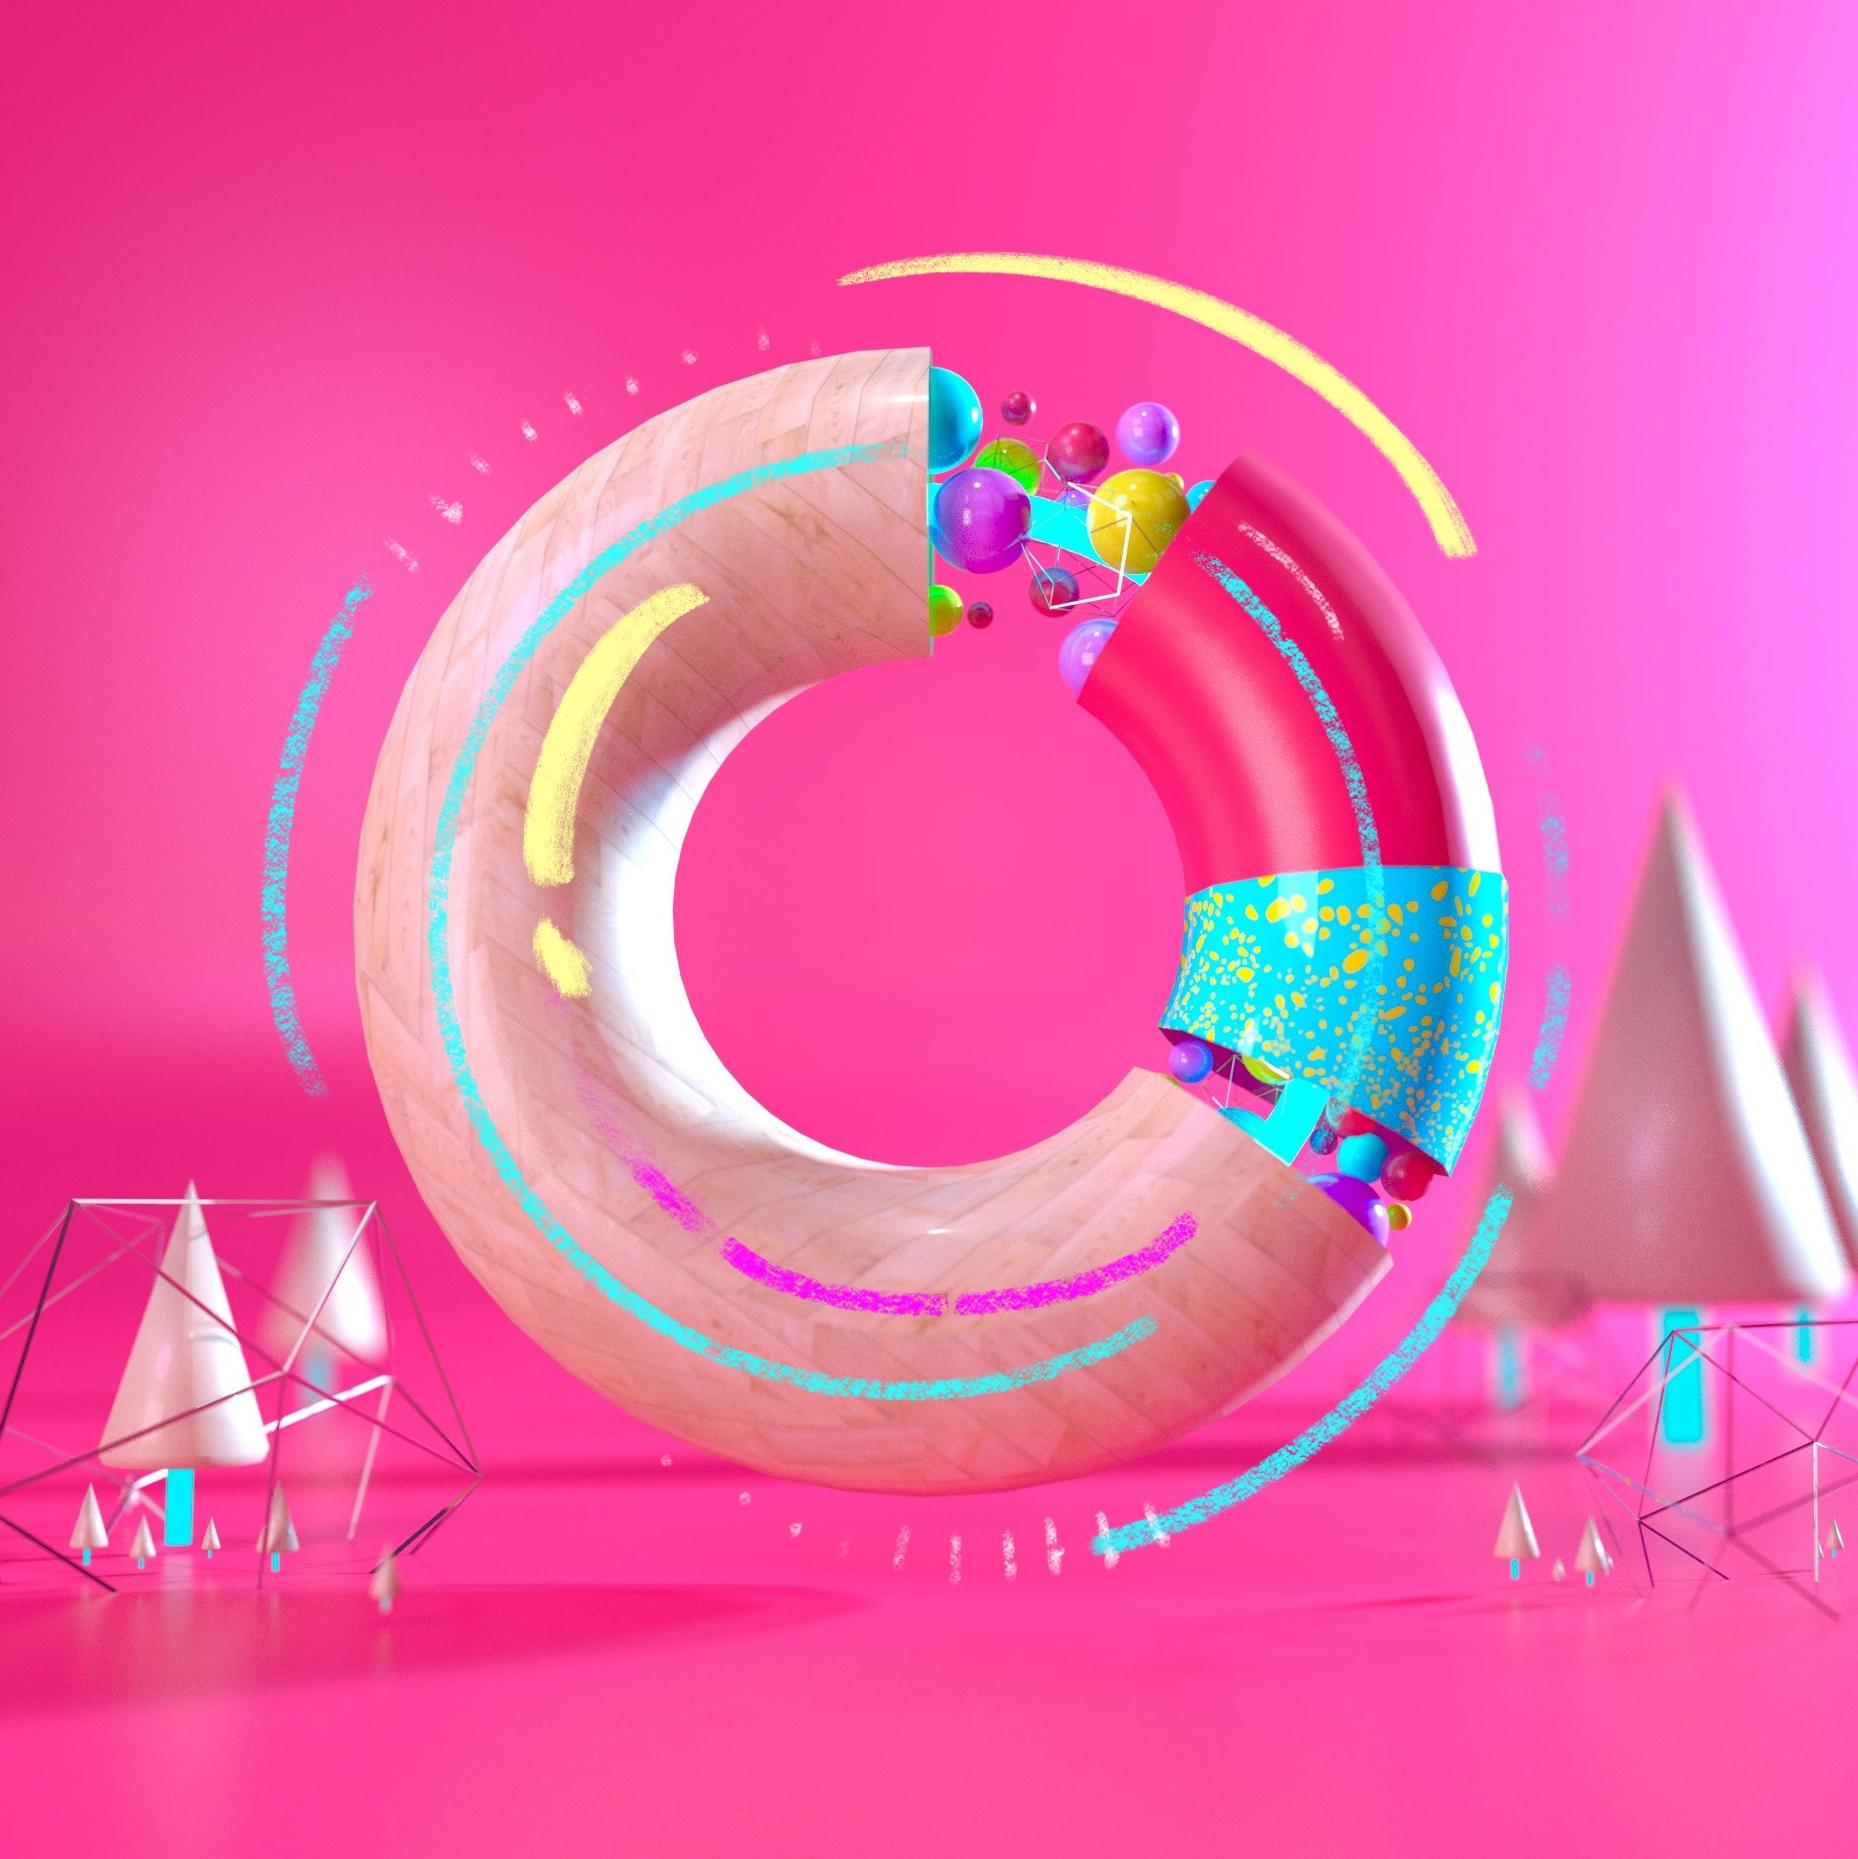 chris-winterton-O-typography-3D-36daysoftype.jpg